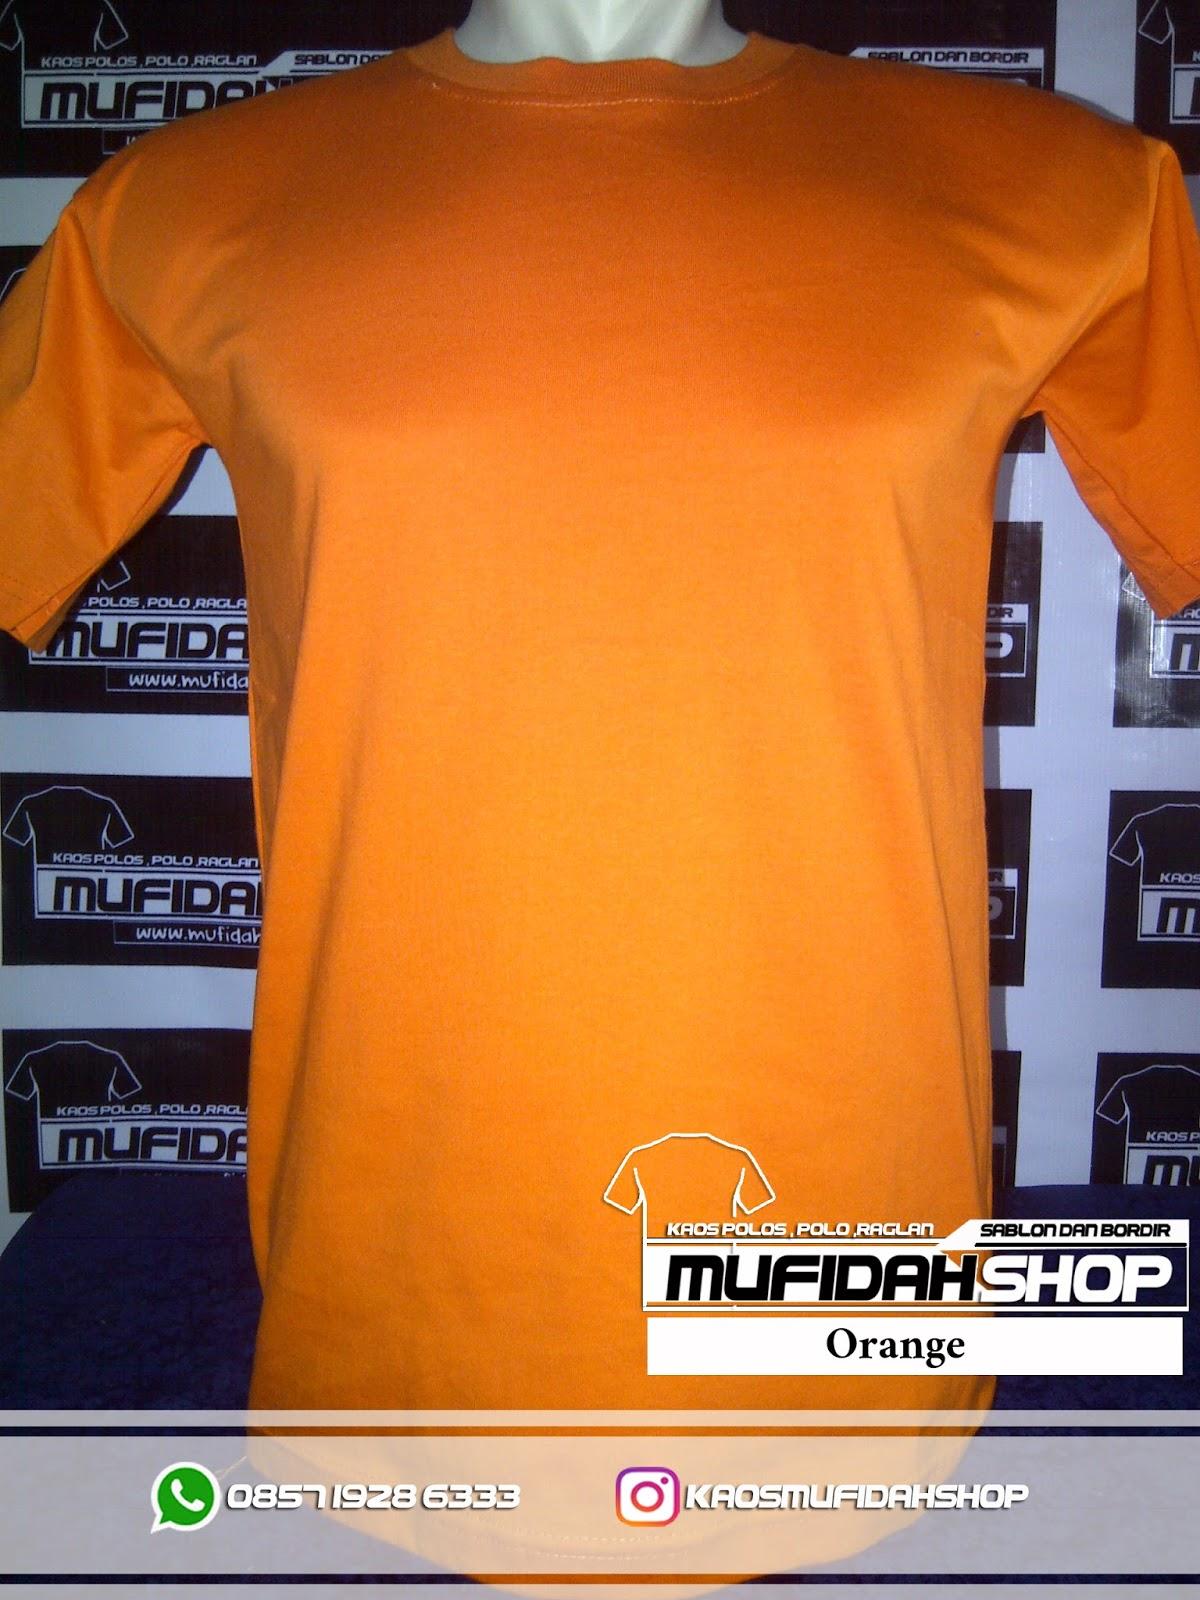 Mei 2017 Kaosmufidahshop Kaos Polos Bahan Carded Tangan Panjang Menggunakan Cotton Soft Lembut Yang Nyaman Digunakan Hadir Dengan Berbagai Pilihan Warna Dan Ukuranlebih Untuk Anak